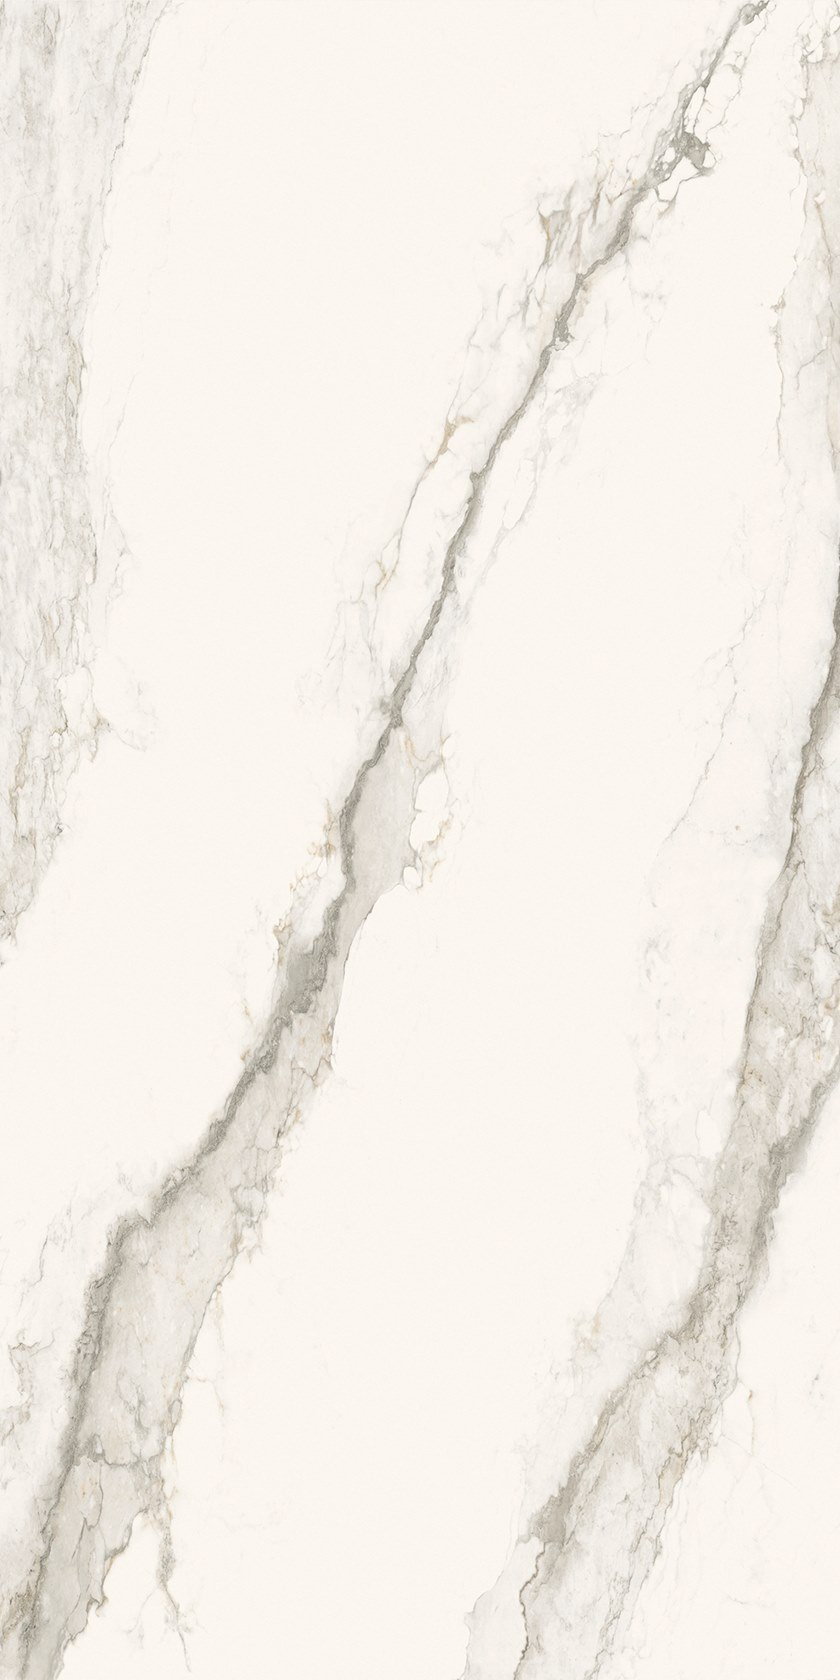 Larsen Super Blanco-Gris Pulido Brillo / High-gloss Polished 150x300 cm